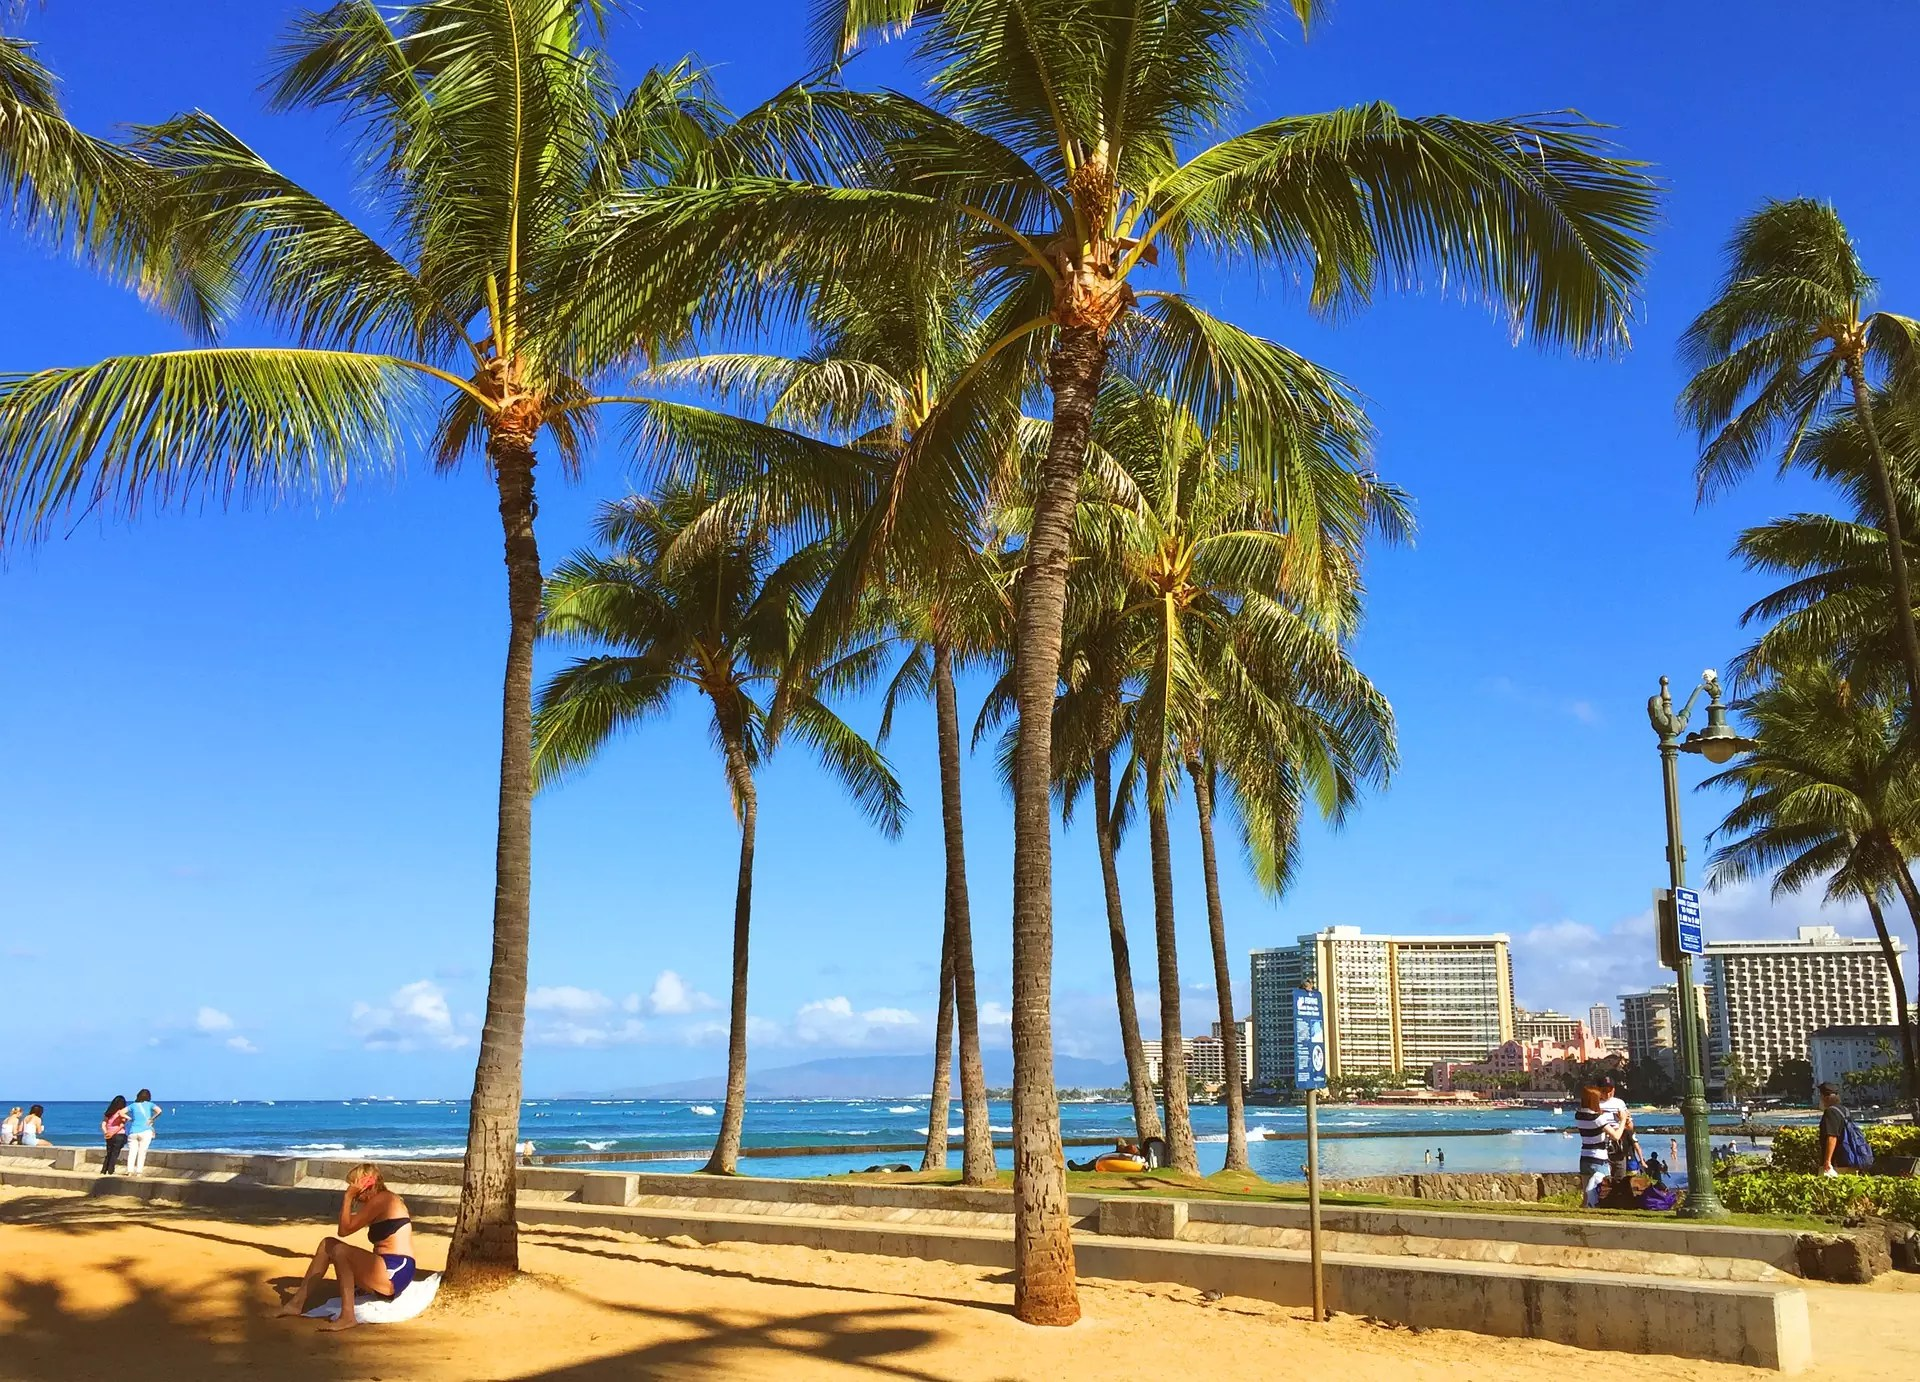 Anthony Bourdain Hawaii - Honolulu, Hawaii - photo by tommy143 under Pixabay License